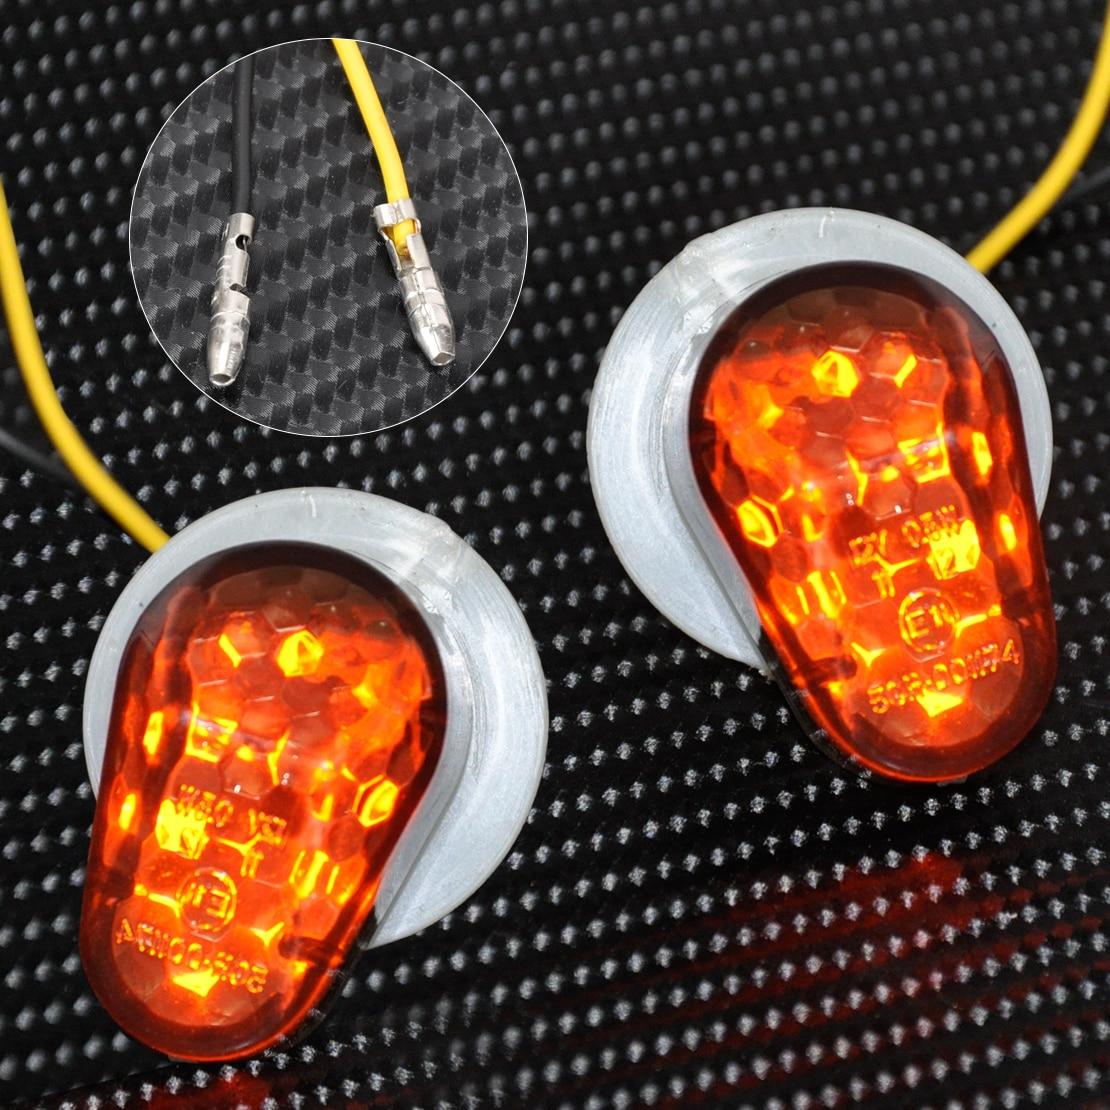 Smoke LED Turn Signal Indicator Blinker Flush Mount  For Yamaha YZF R1 R6S FZ6R